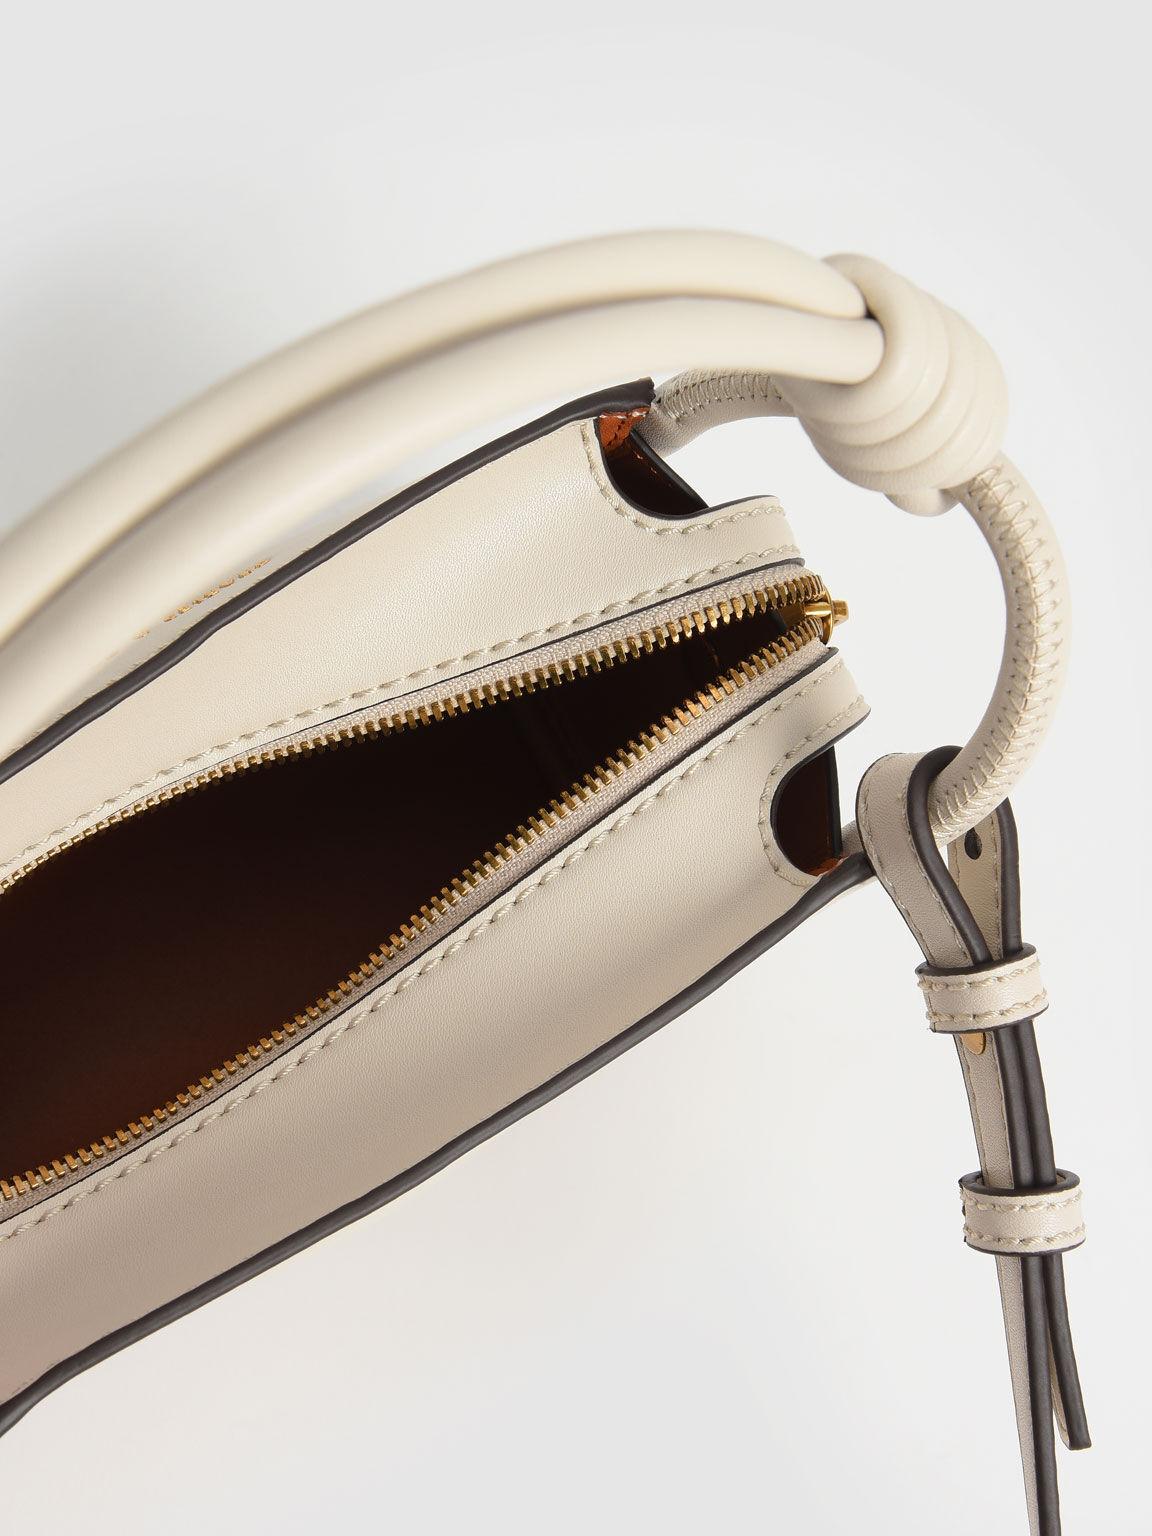 繩索手提方包, 奶油色, hi-res